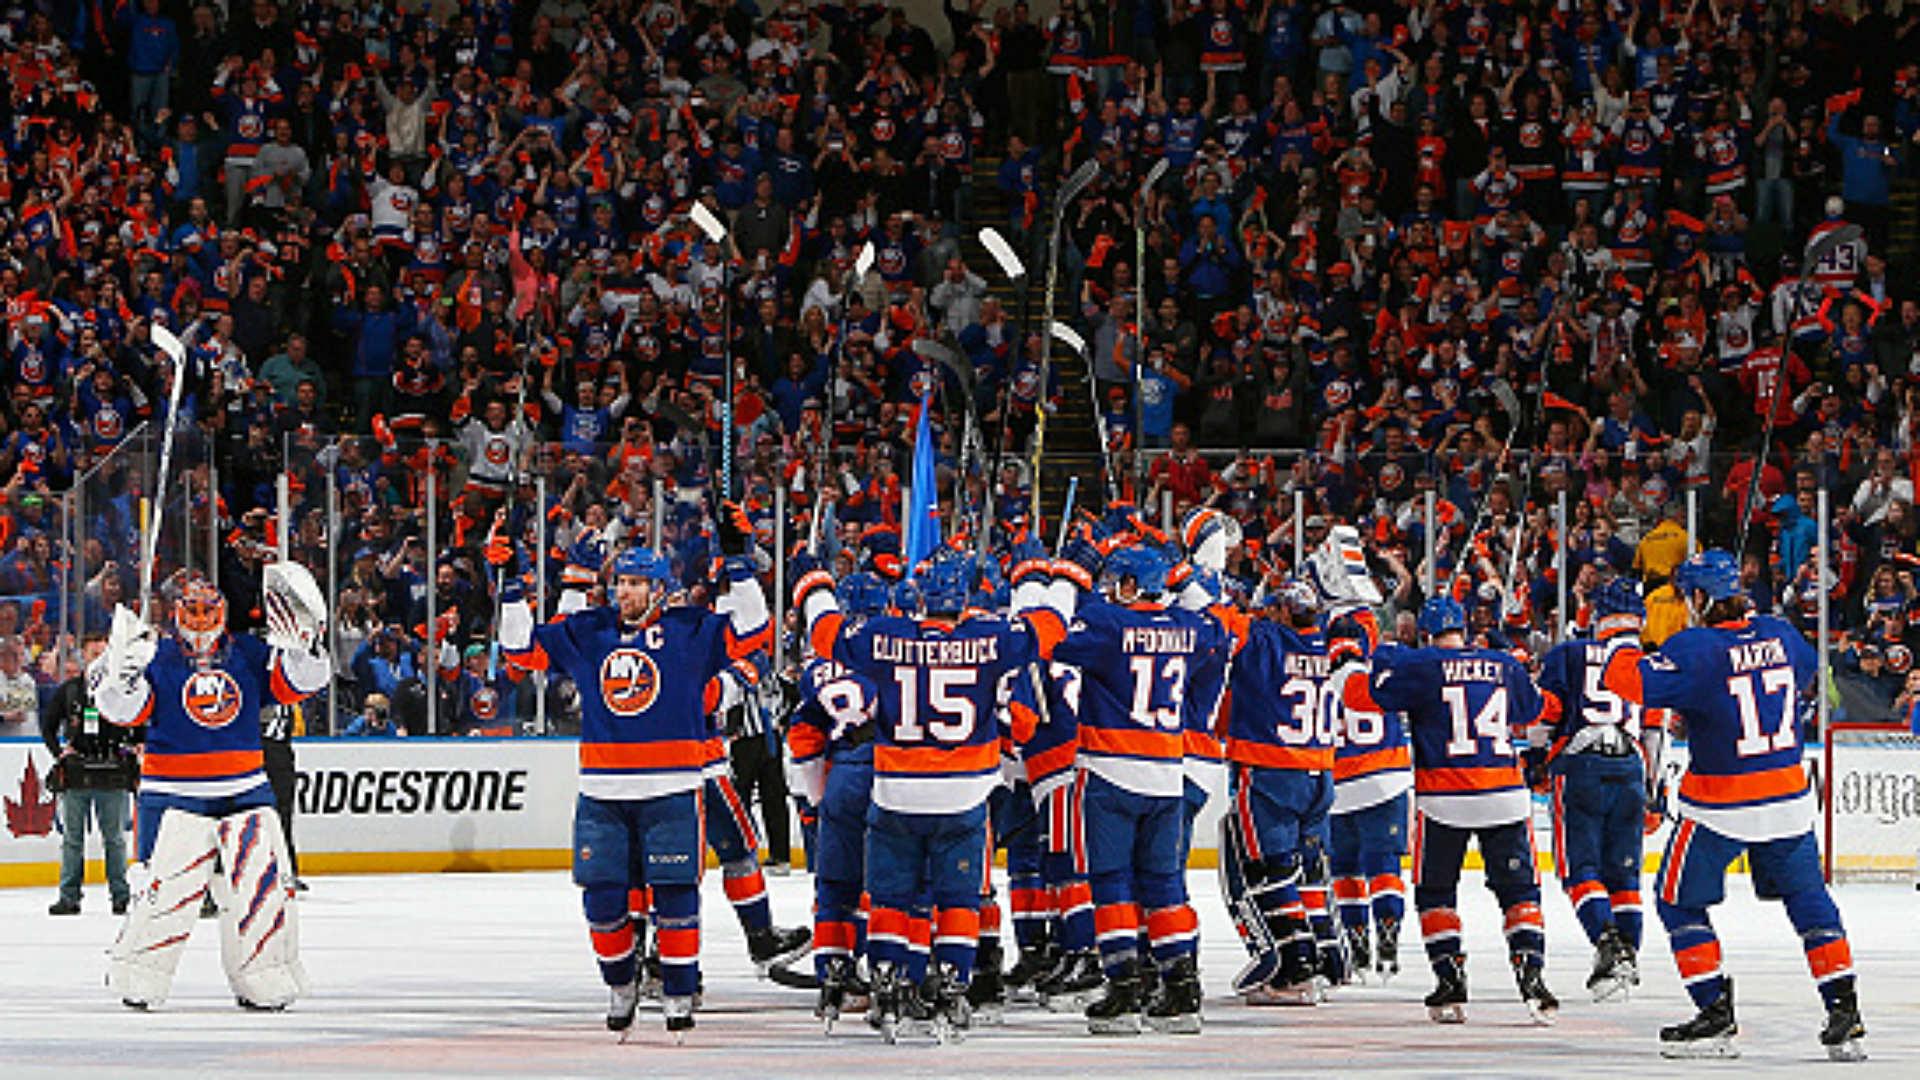 New York Rangers Wallpaper Hd New York Islanders Wallpaper 183 ①